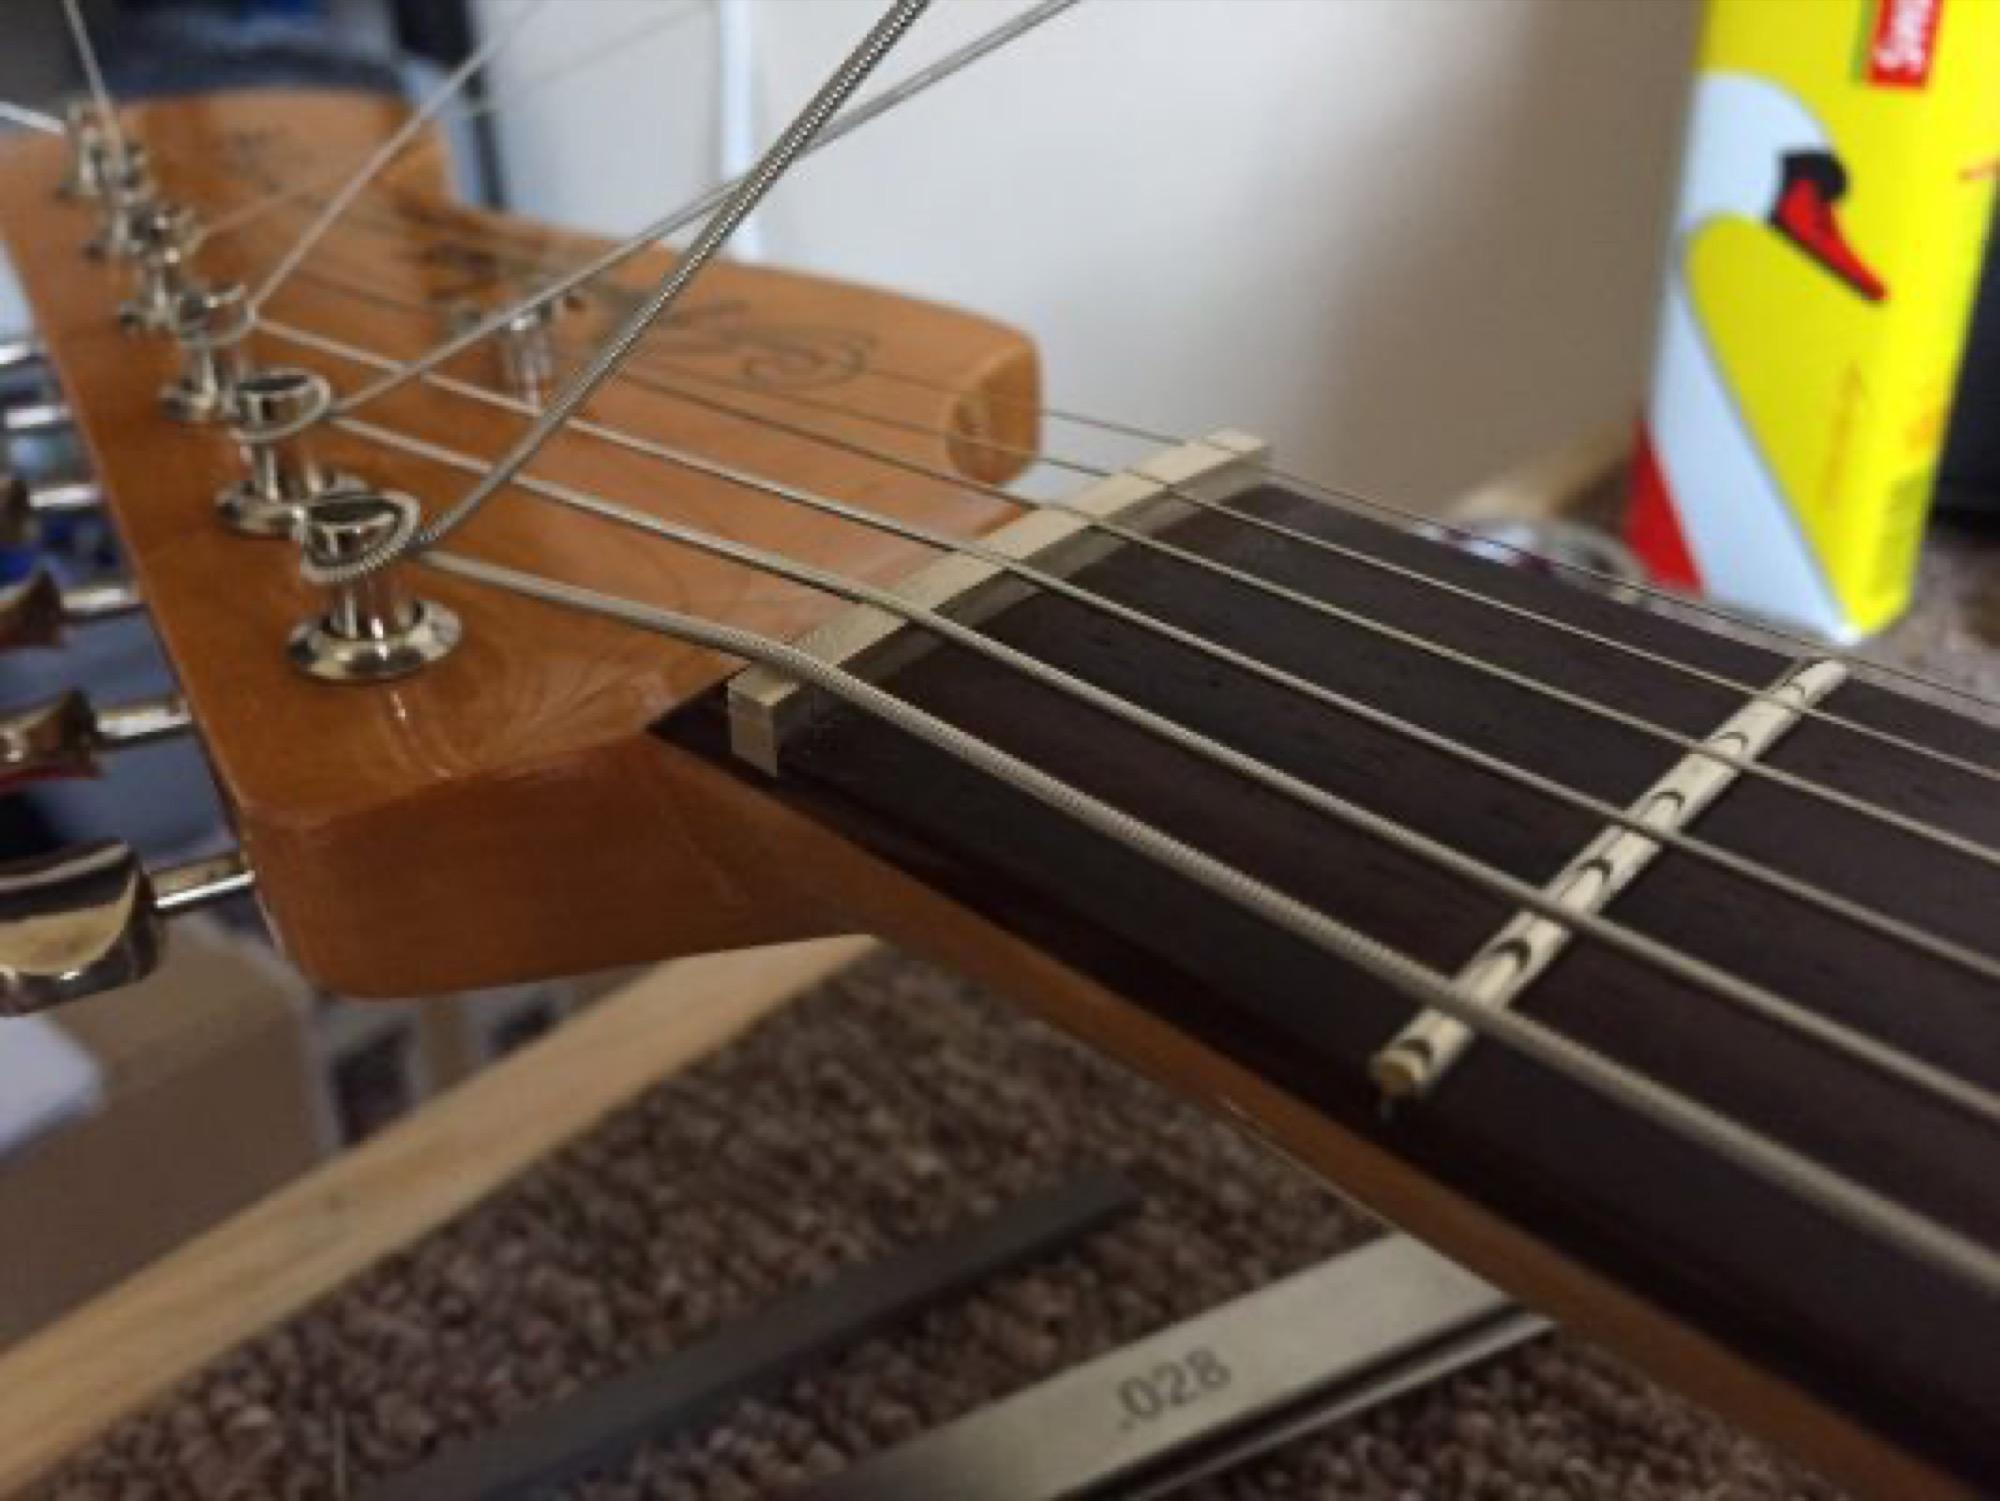 String positioning